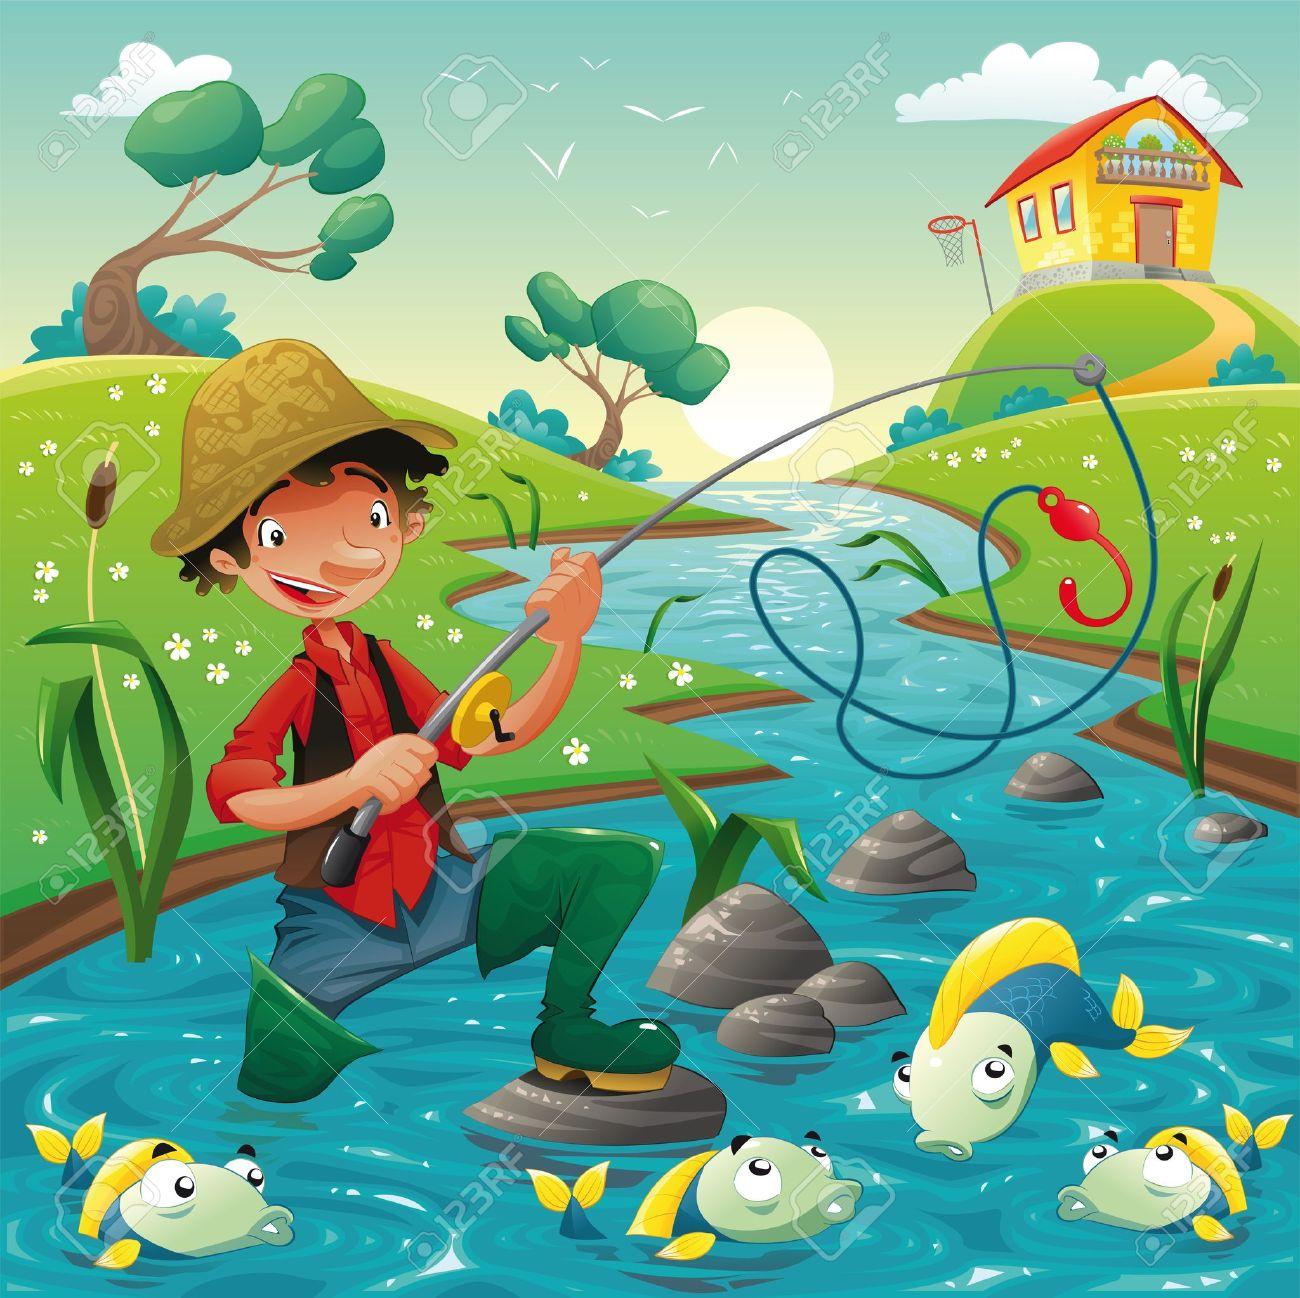 картина на рыбалке для детского сада